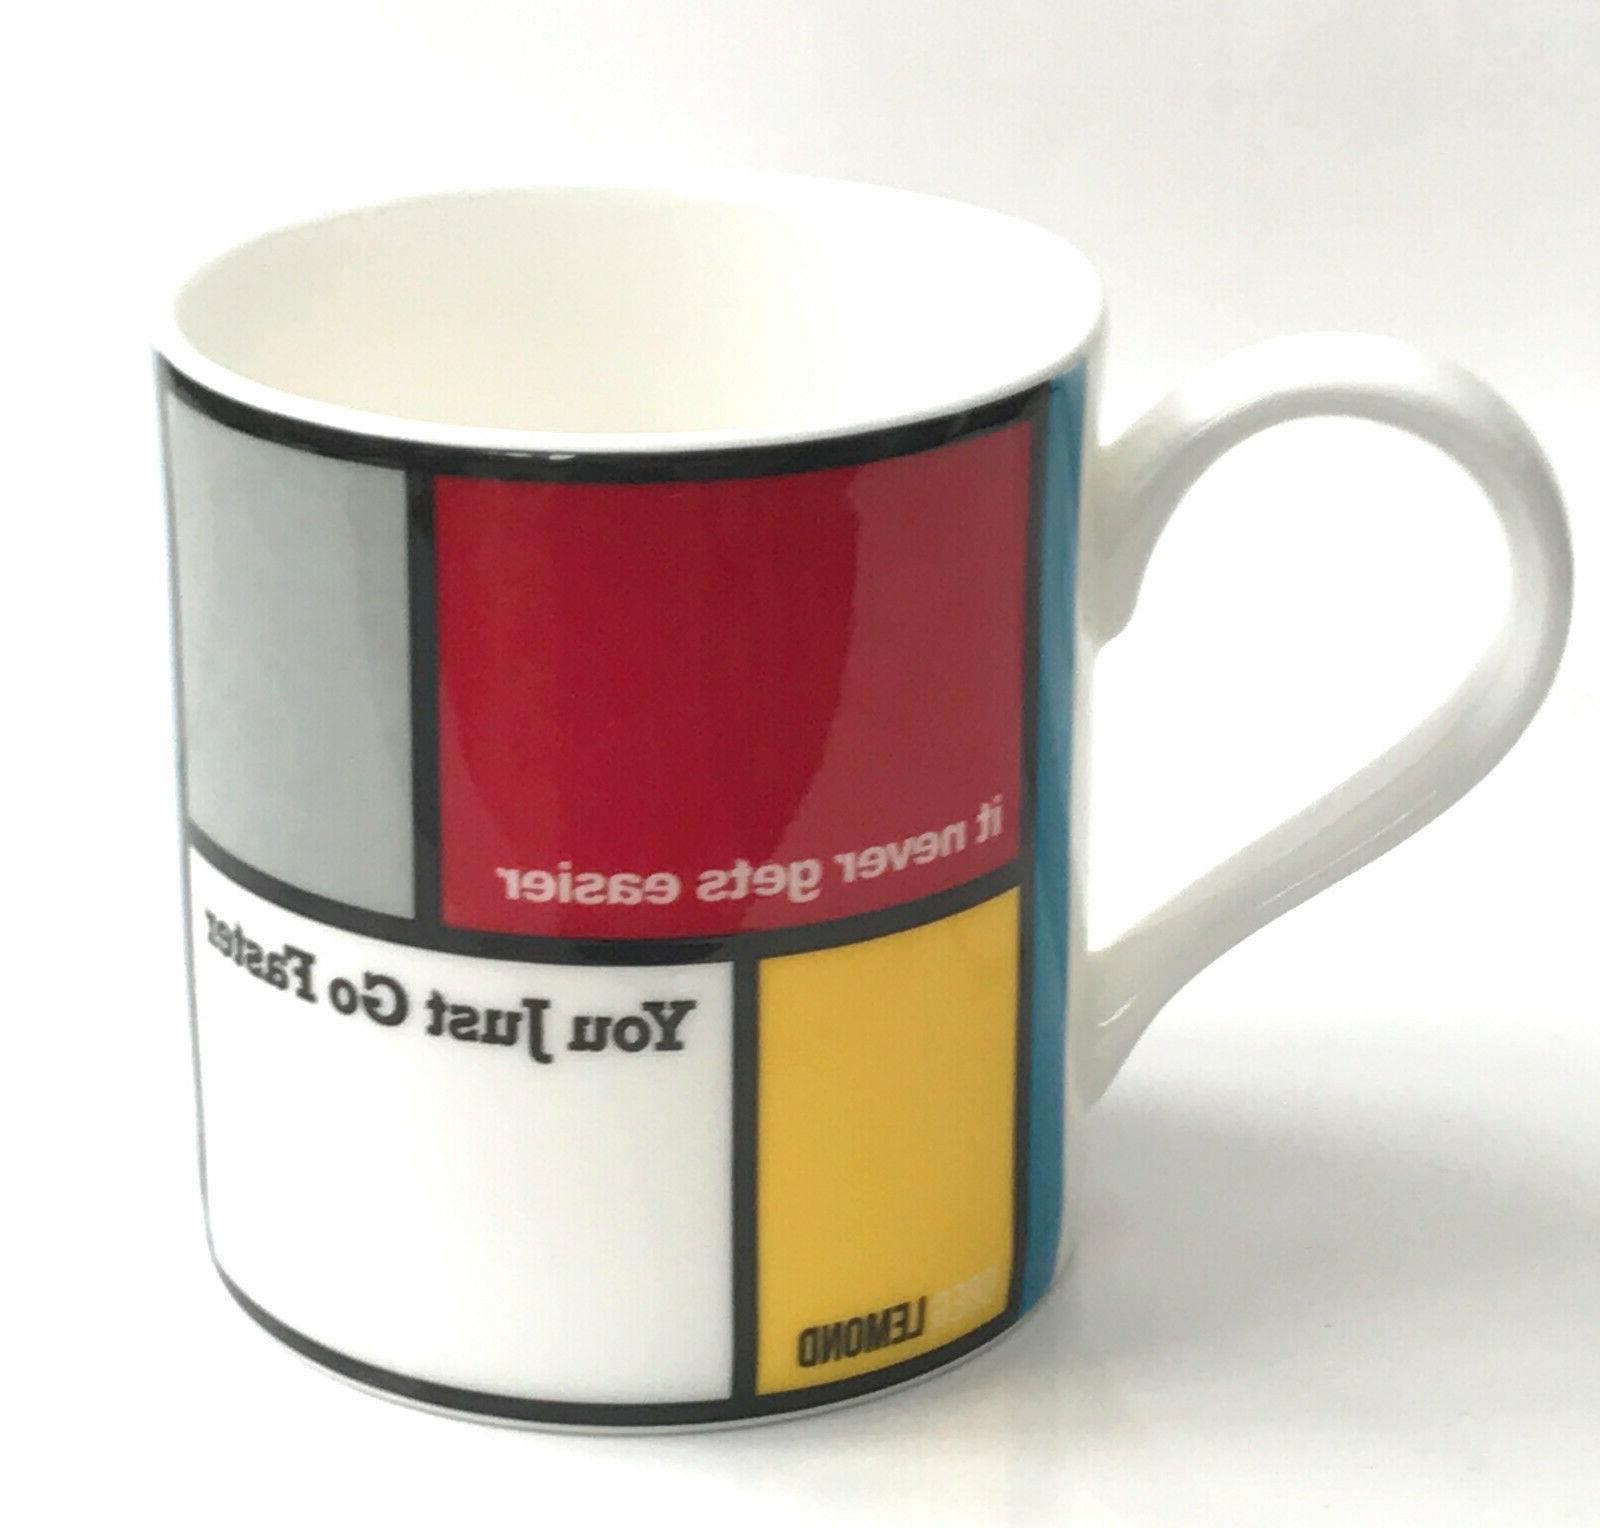 Fine Mug France Greg Mondrian